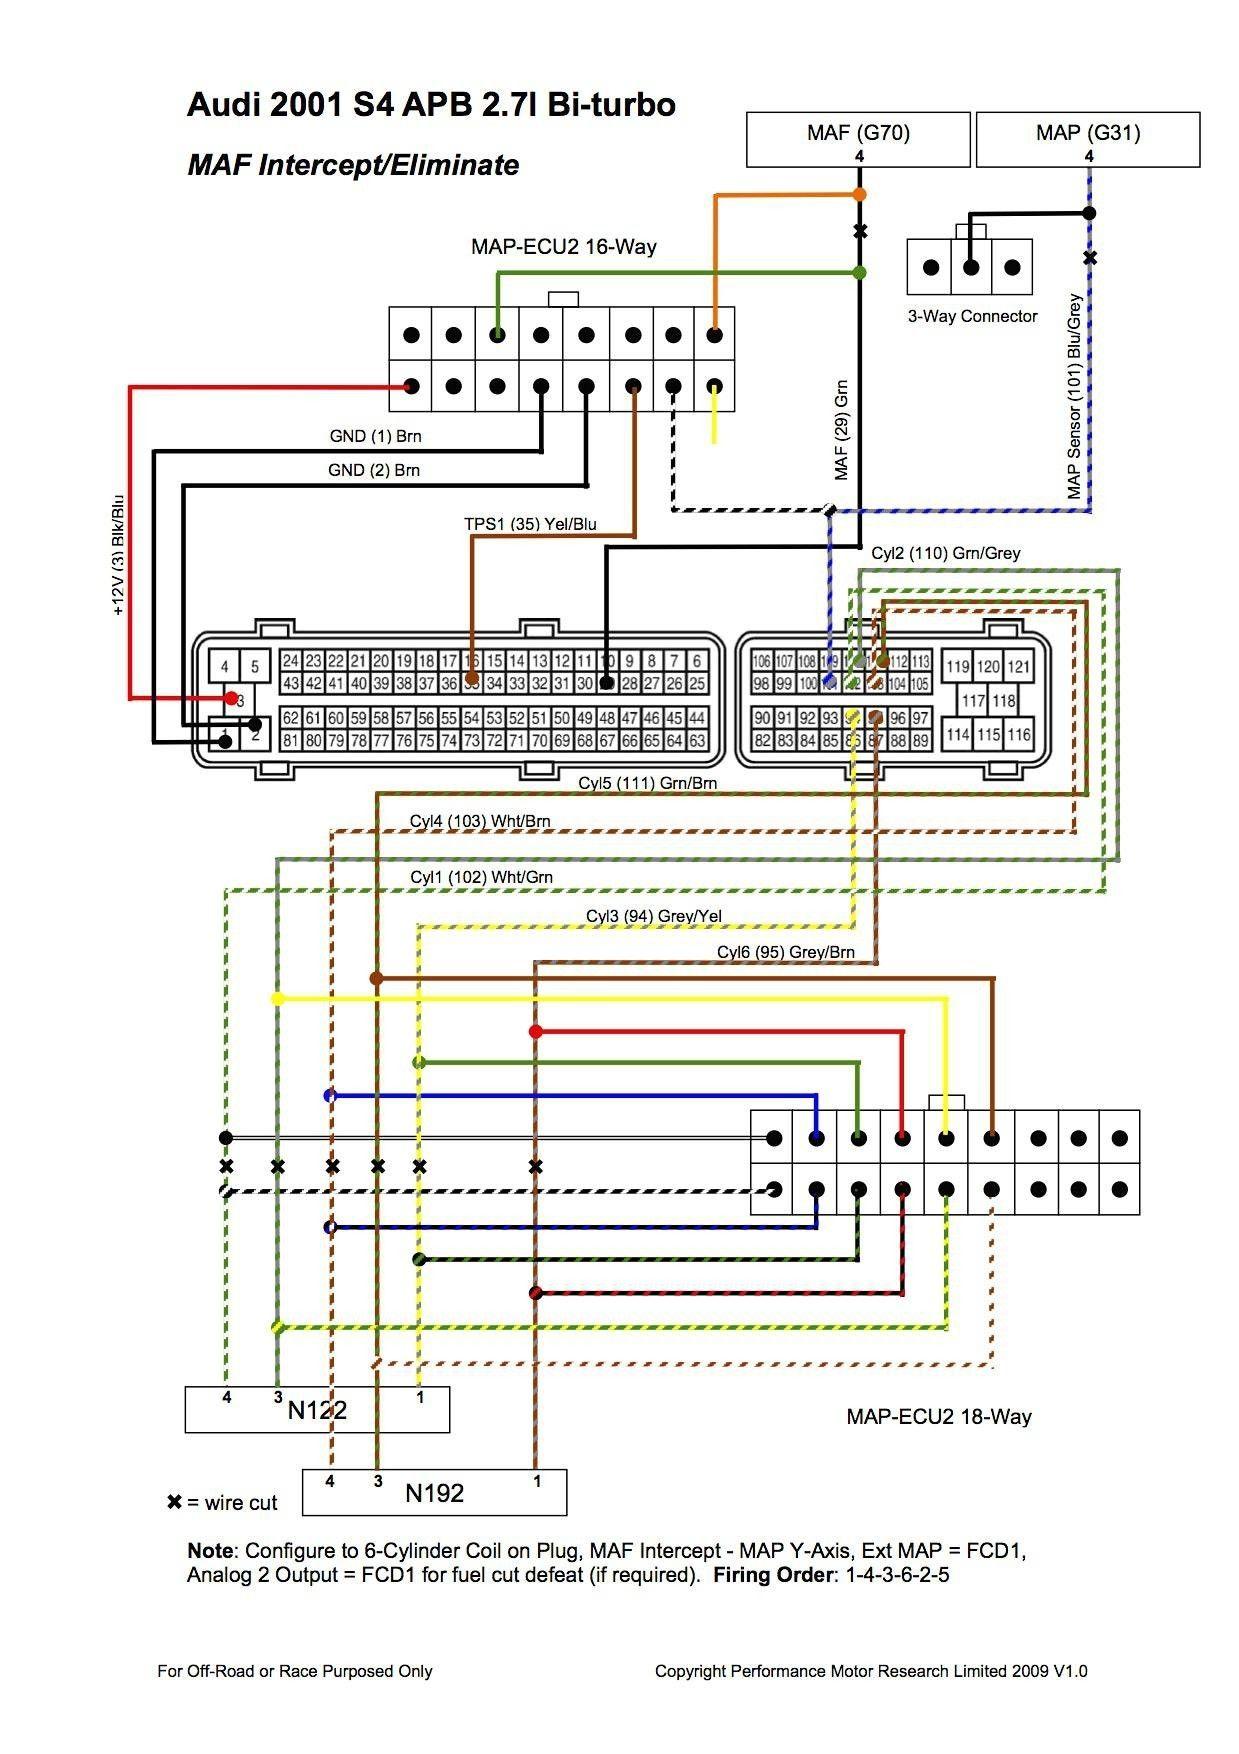 Unique Wiring Diagram 12v Alternator Diagrams Digramssample Diagramimages Wiringdiagramsample Wir Trailer Wiring Diagram Electrical Wiring Diagram Diagram